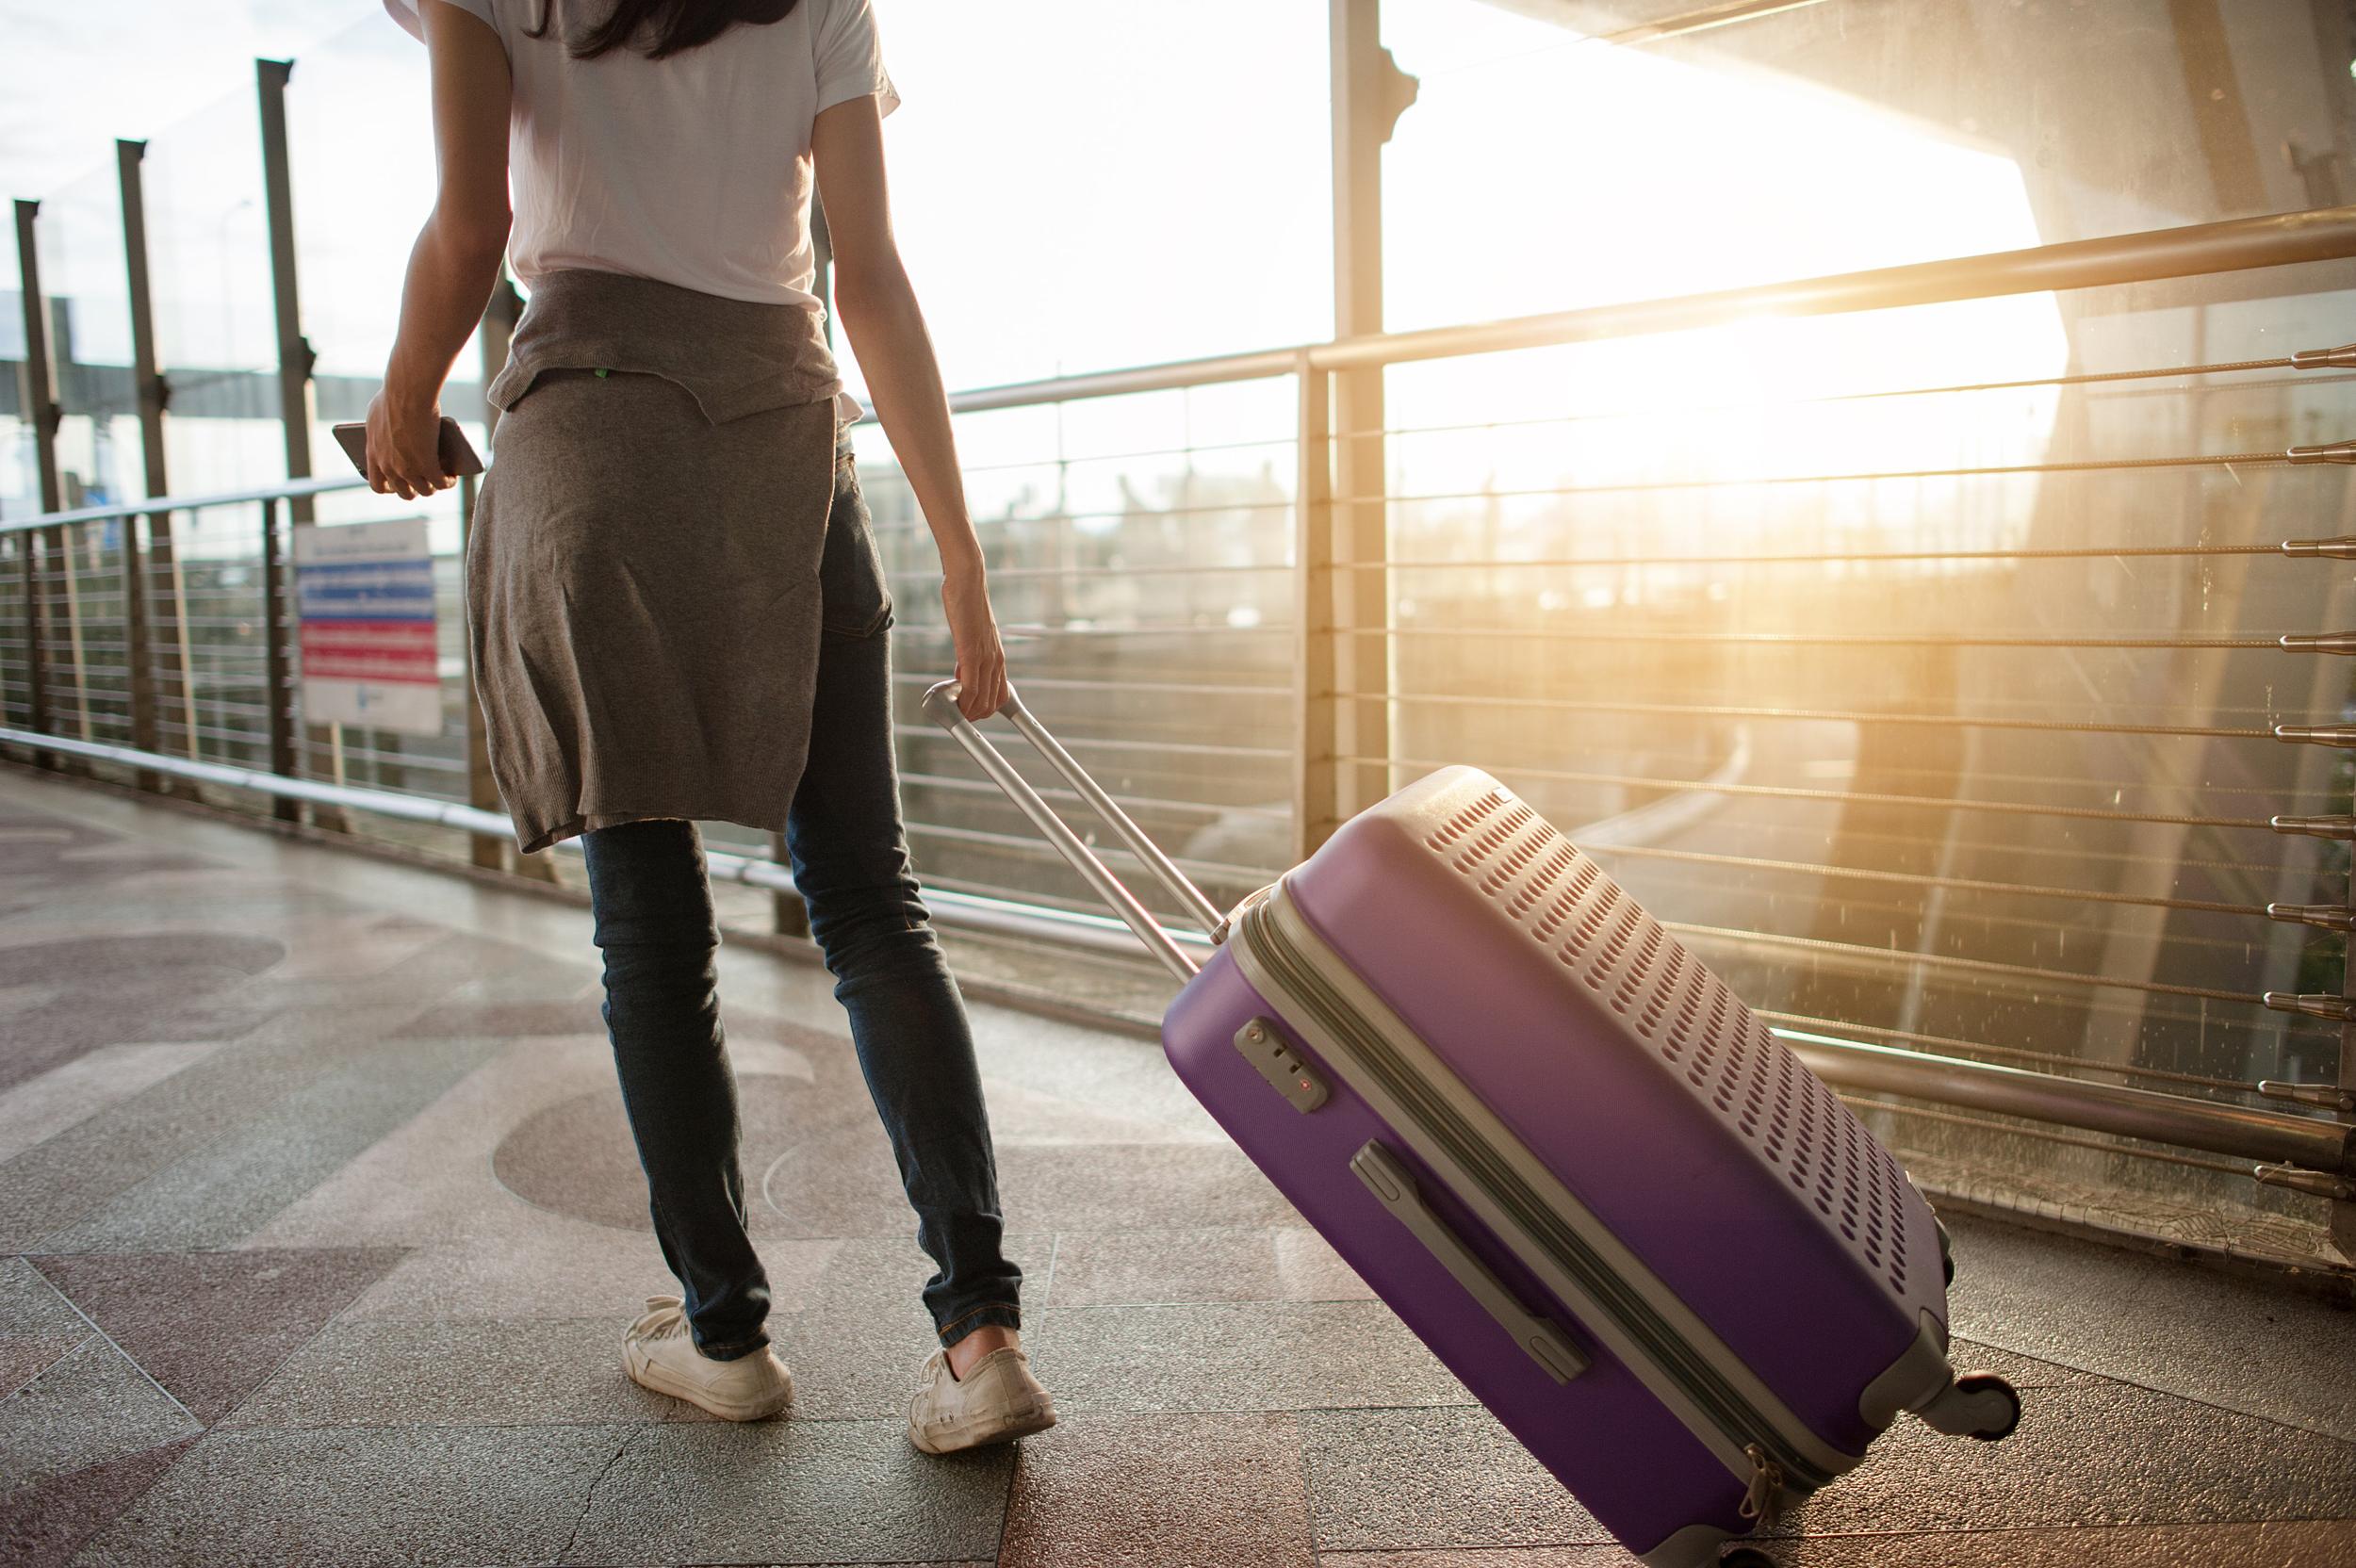 https://media1.s-nbcnews.com/i/newscms/2018_40/2229681/171116-better-stock-woman-traveling-airport-ew-624p_78e41f3a960f8fa579390920f9dca06f.jpg